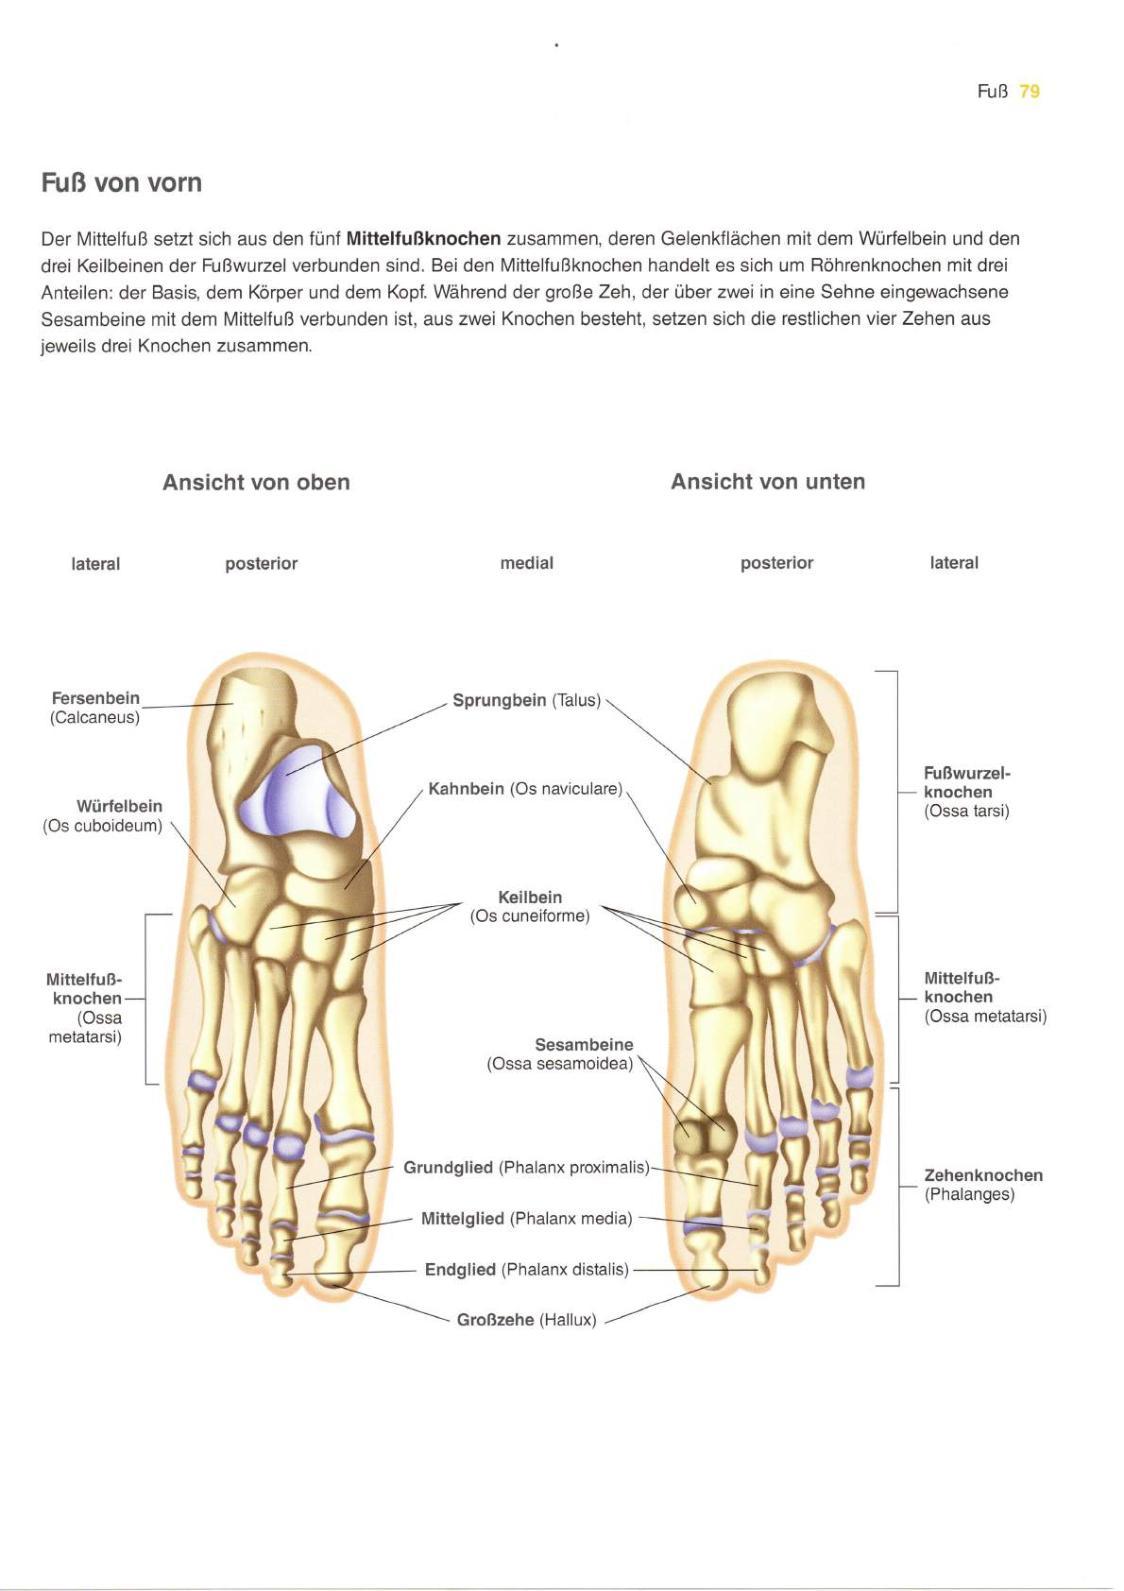 Gesundheitsatlas Anatomie - CALAMEO Downloader